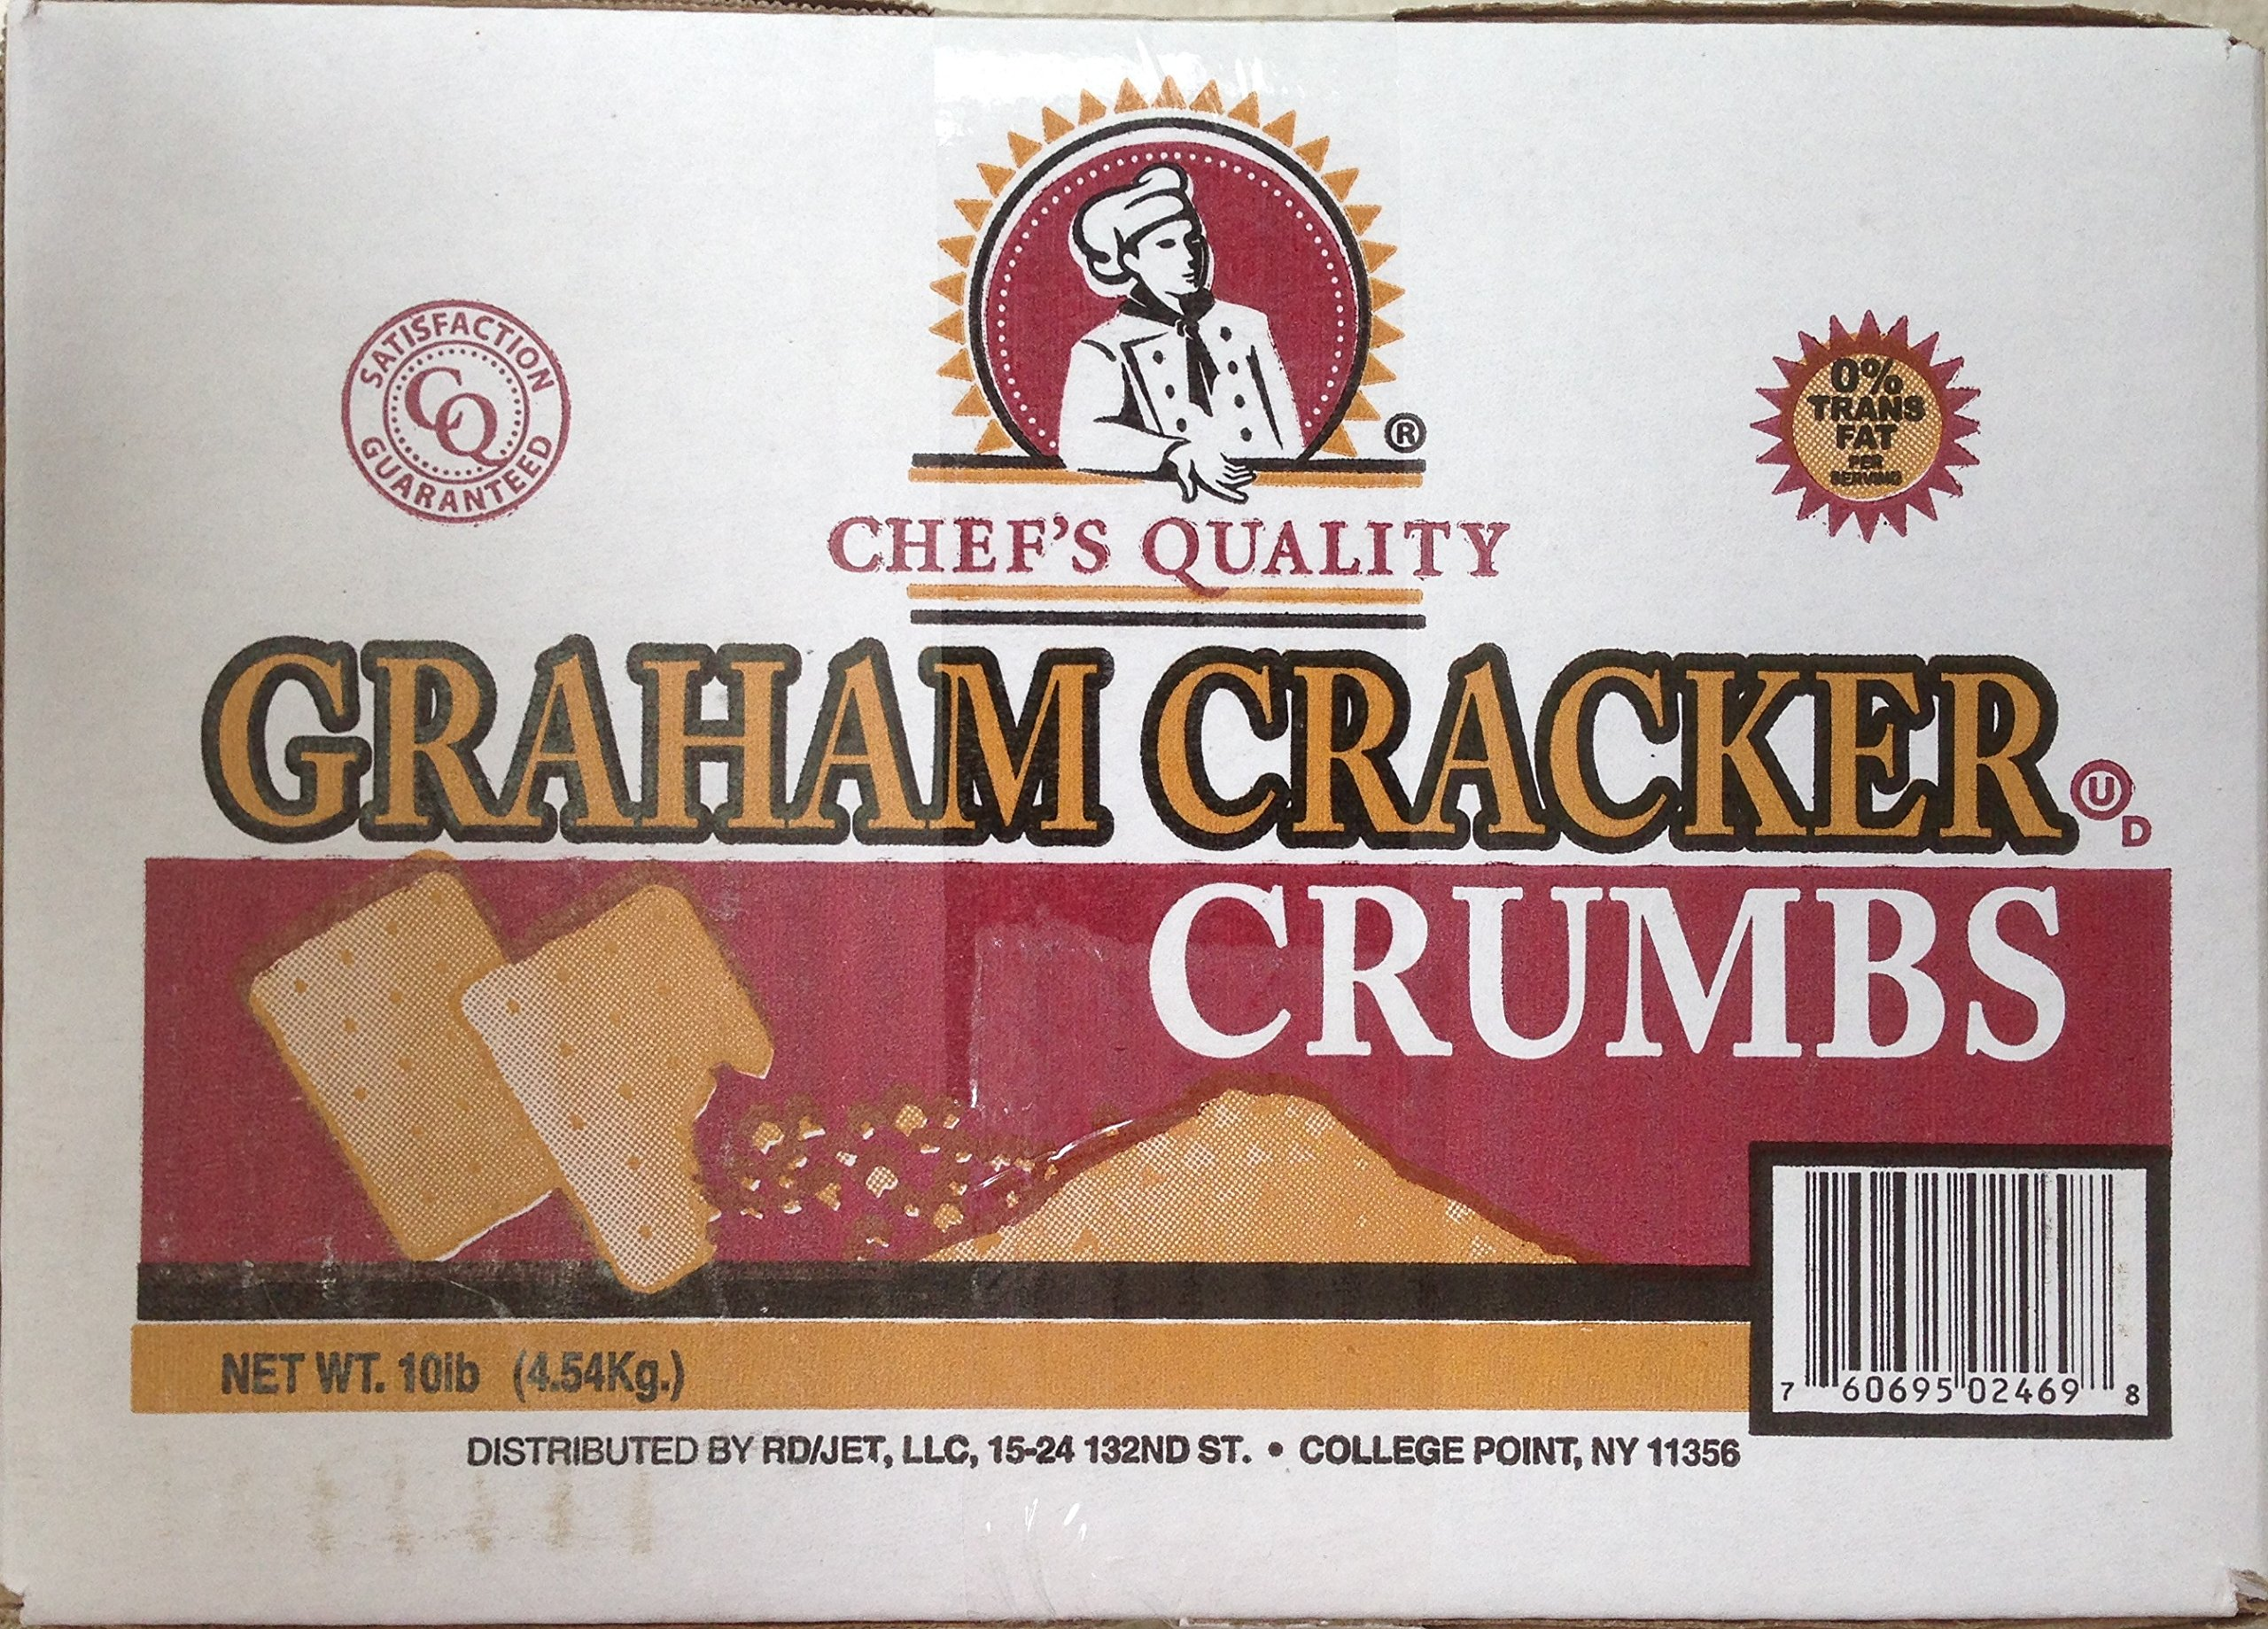 Chef's Quality: Graham Cracker Crumbs 10 Lb.